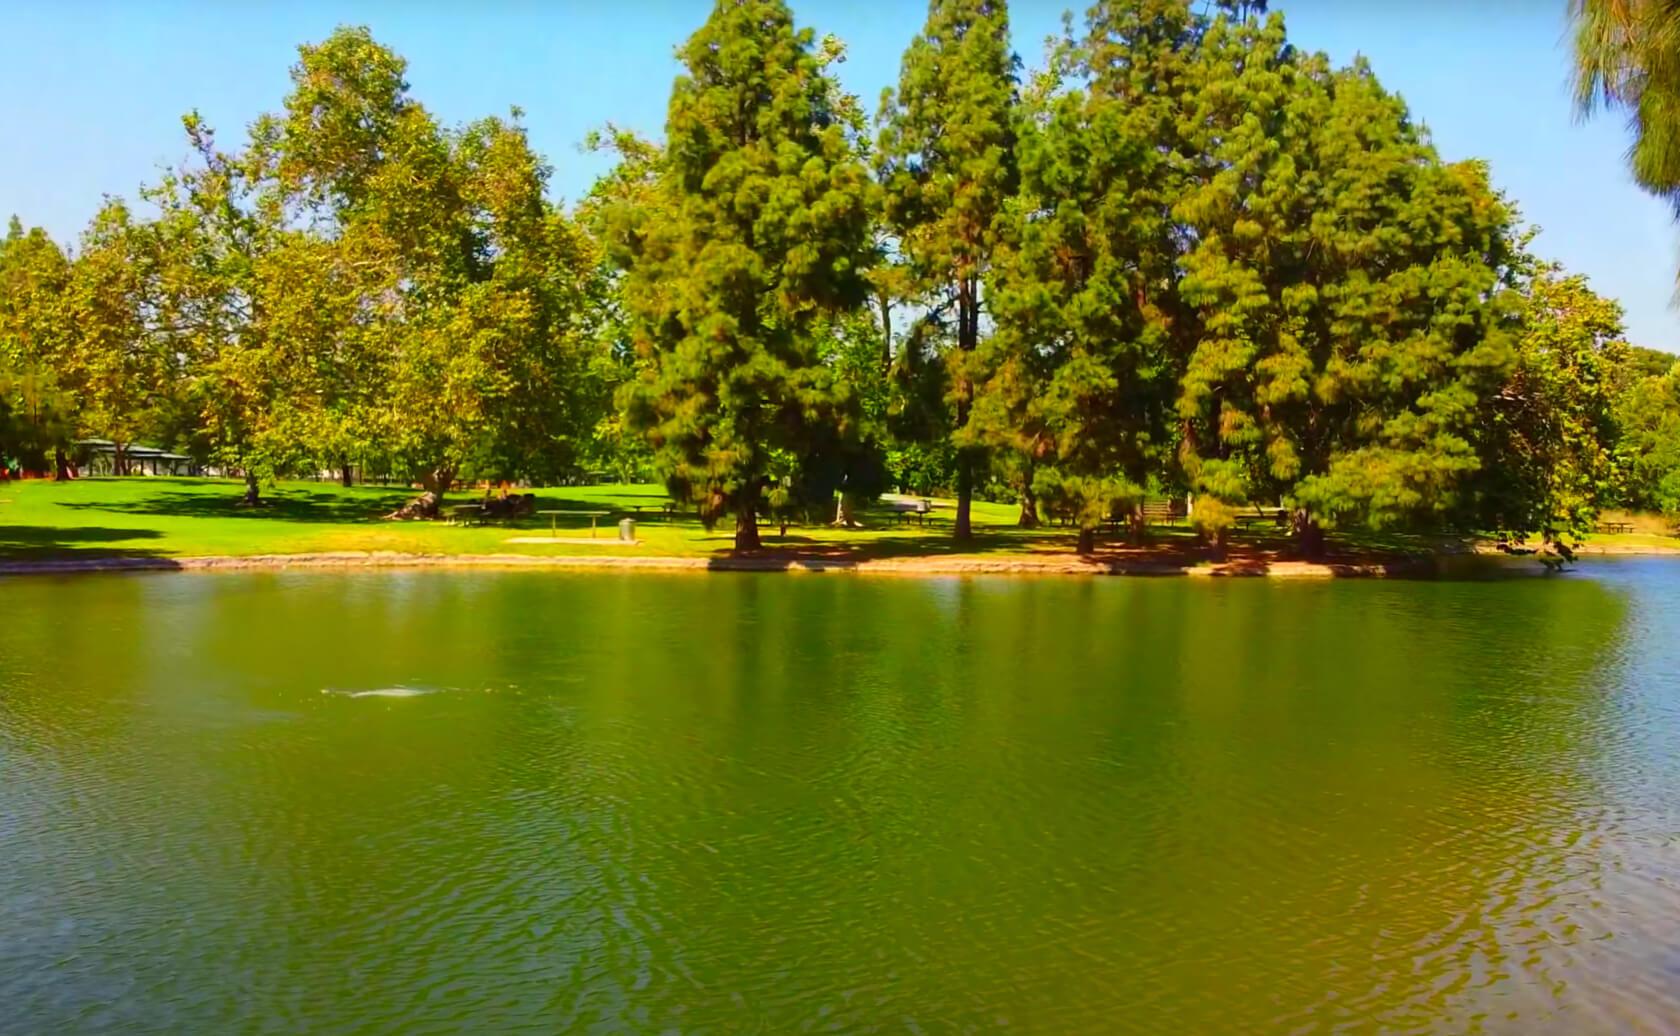 Yorba-Regional-Park-Lake-Fishing-Guide-Report-Anaheim-CA-01 Copy 9